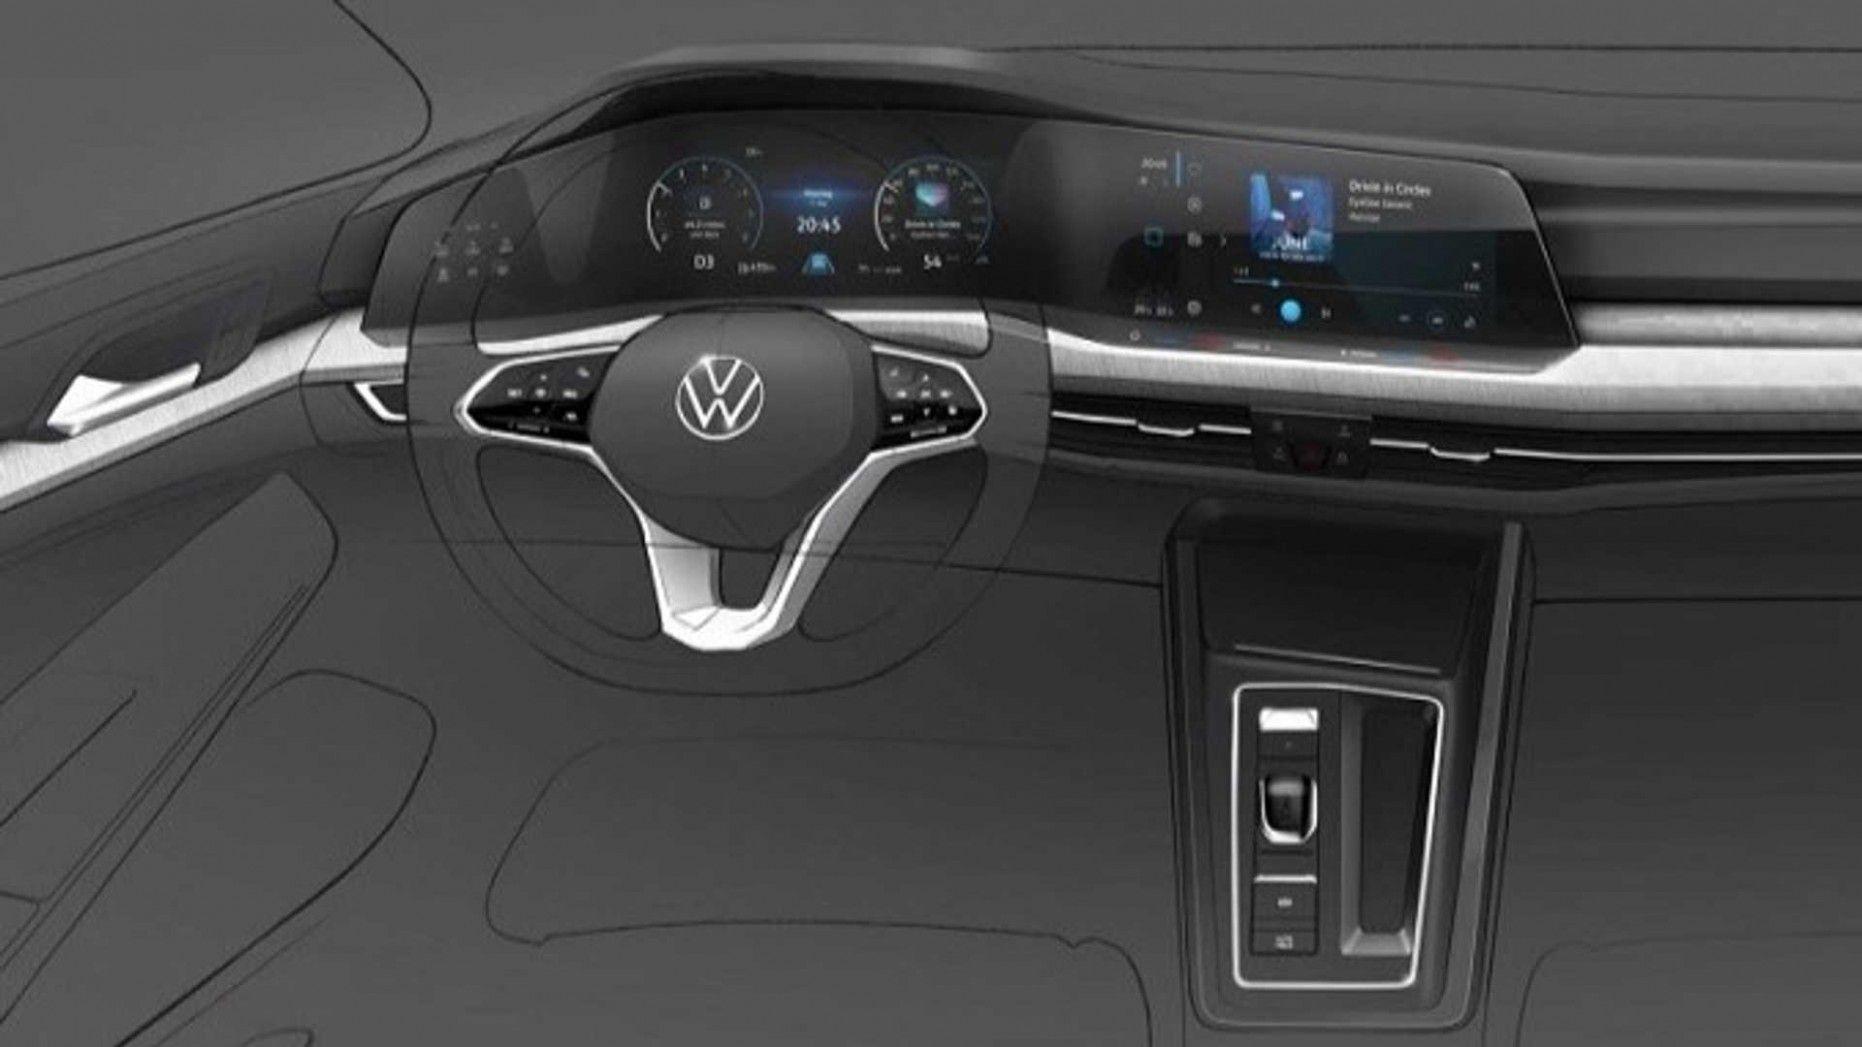 Volkswagen Wolfsburg 2020 Price And Review Volkswagen Golf Volkswagen Golf R Volkswagen